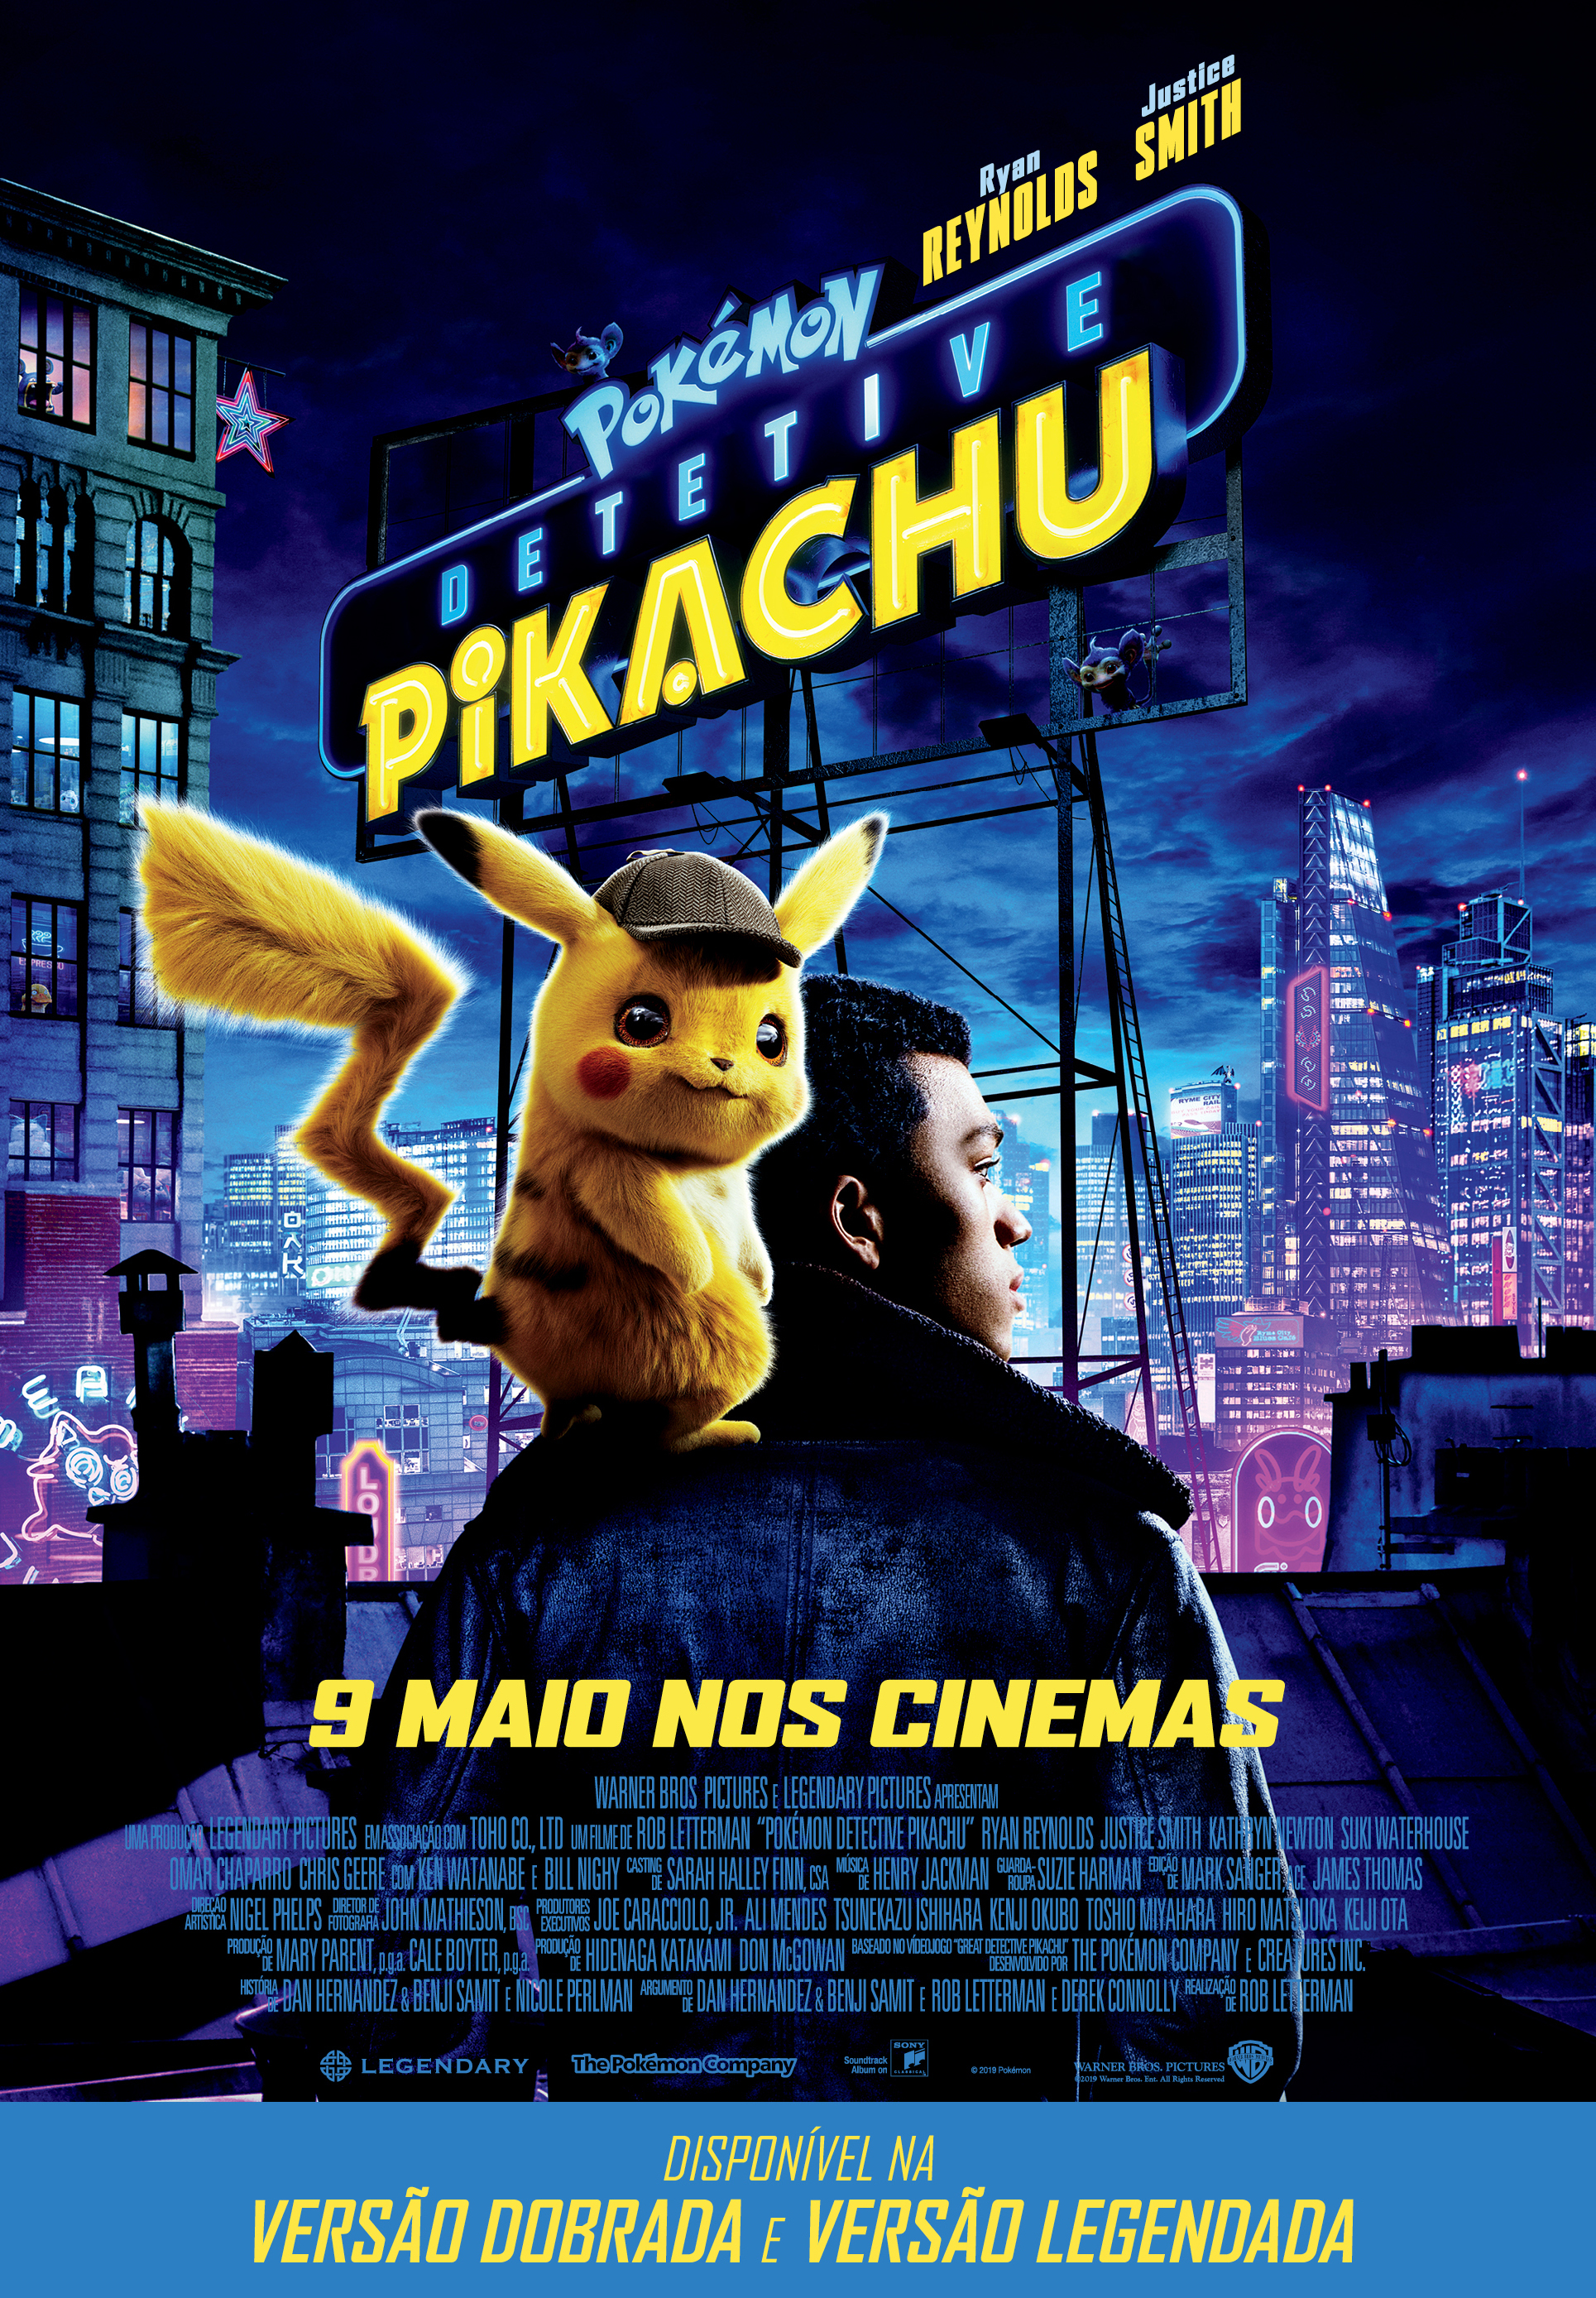 Pokémon: Detective Pikachu - Cinecartaz